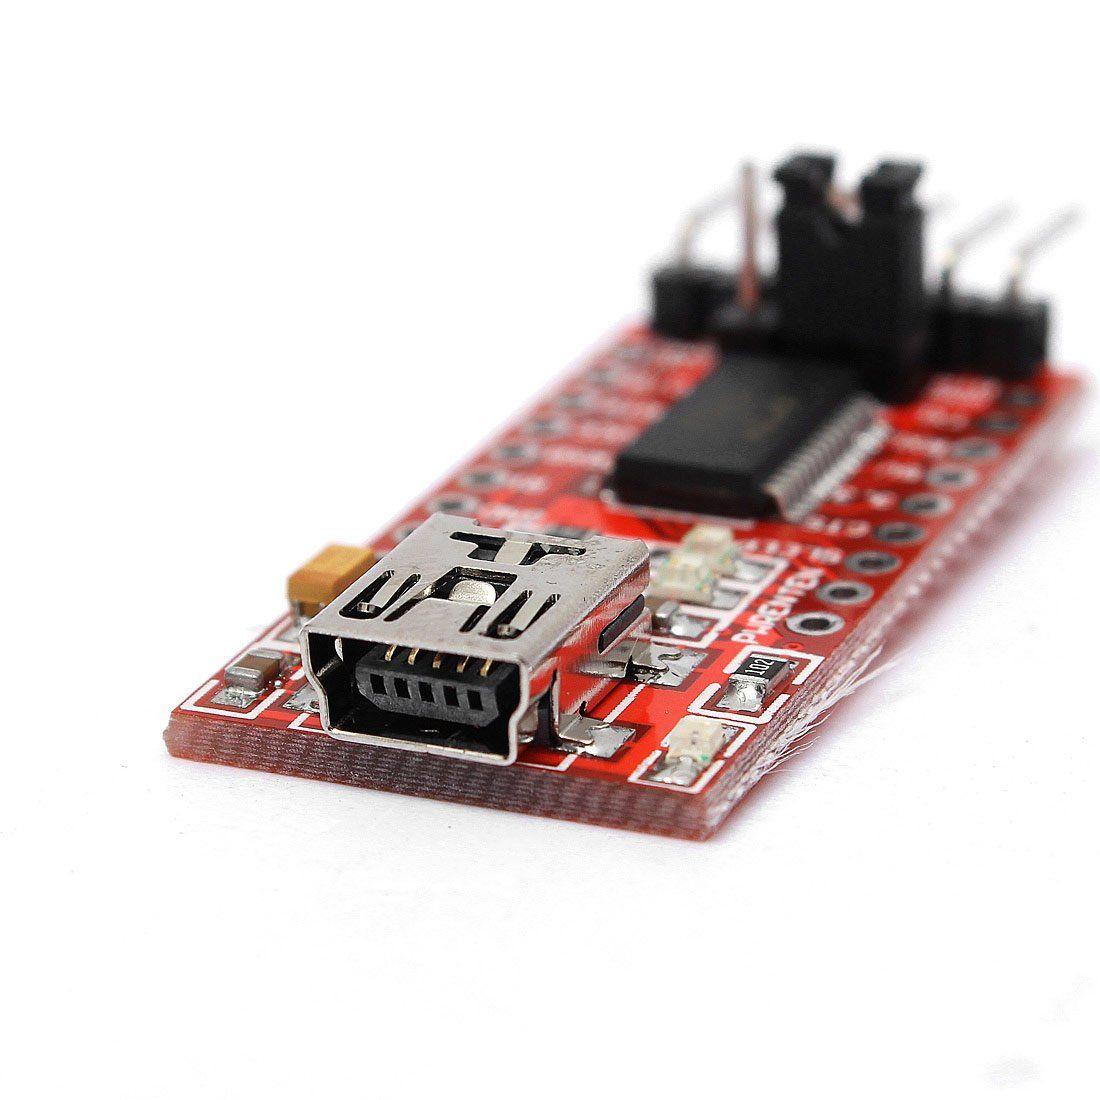 Freeshipping 10pcs Hot Sale FT232RL Module 5V 3.3V FTDI USB TTL conversion adapter Red